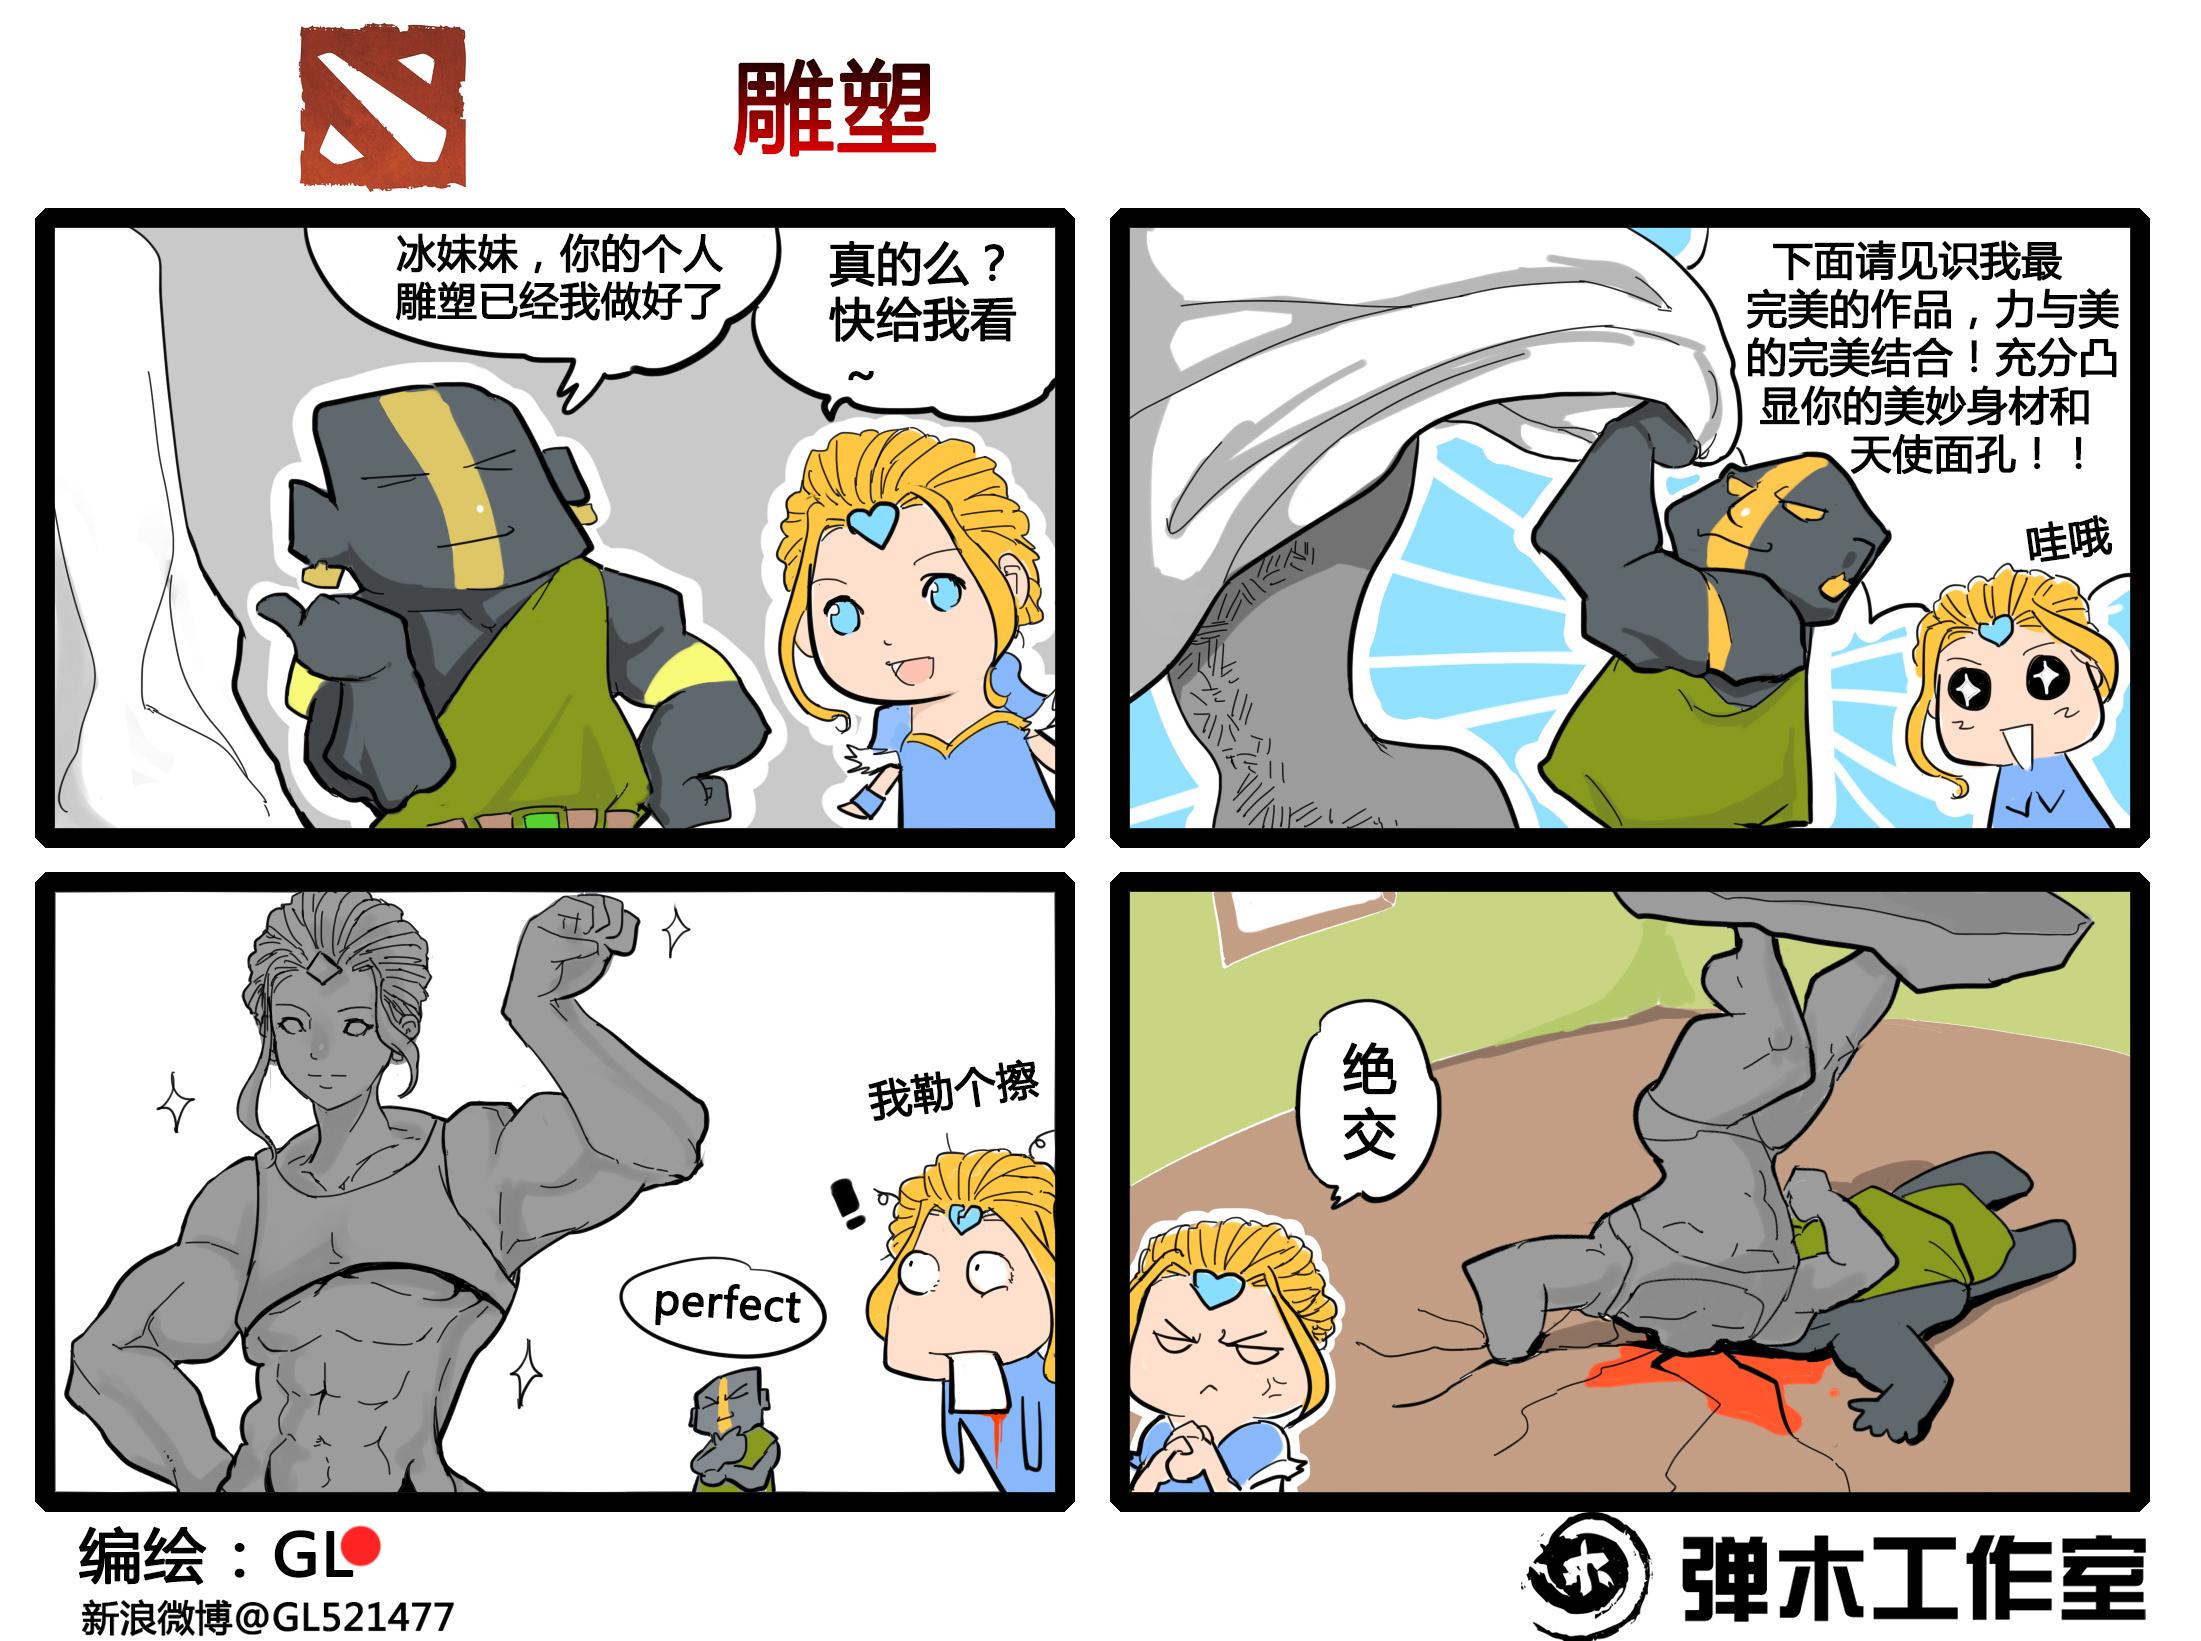 dota2搞笑漫画_肉山黑名单之土猫 dota2泥塑大师爆笑漫画